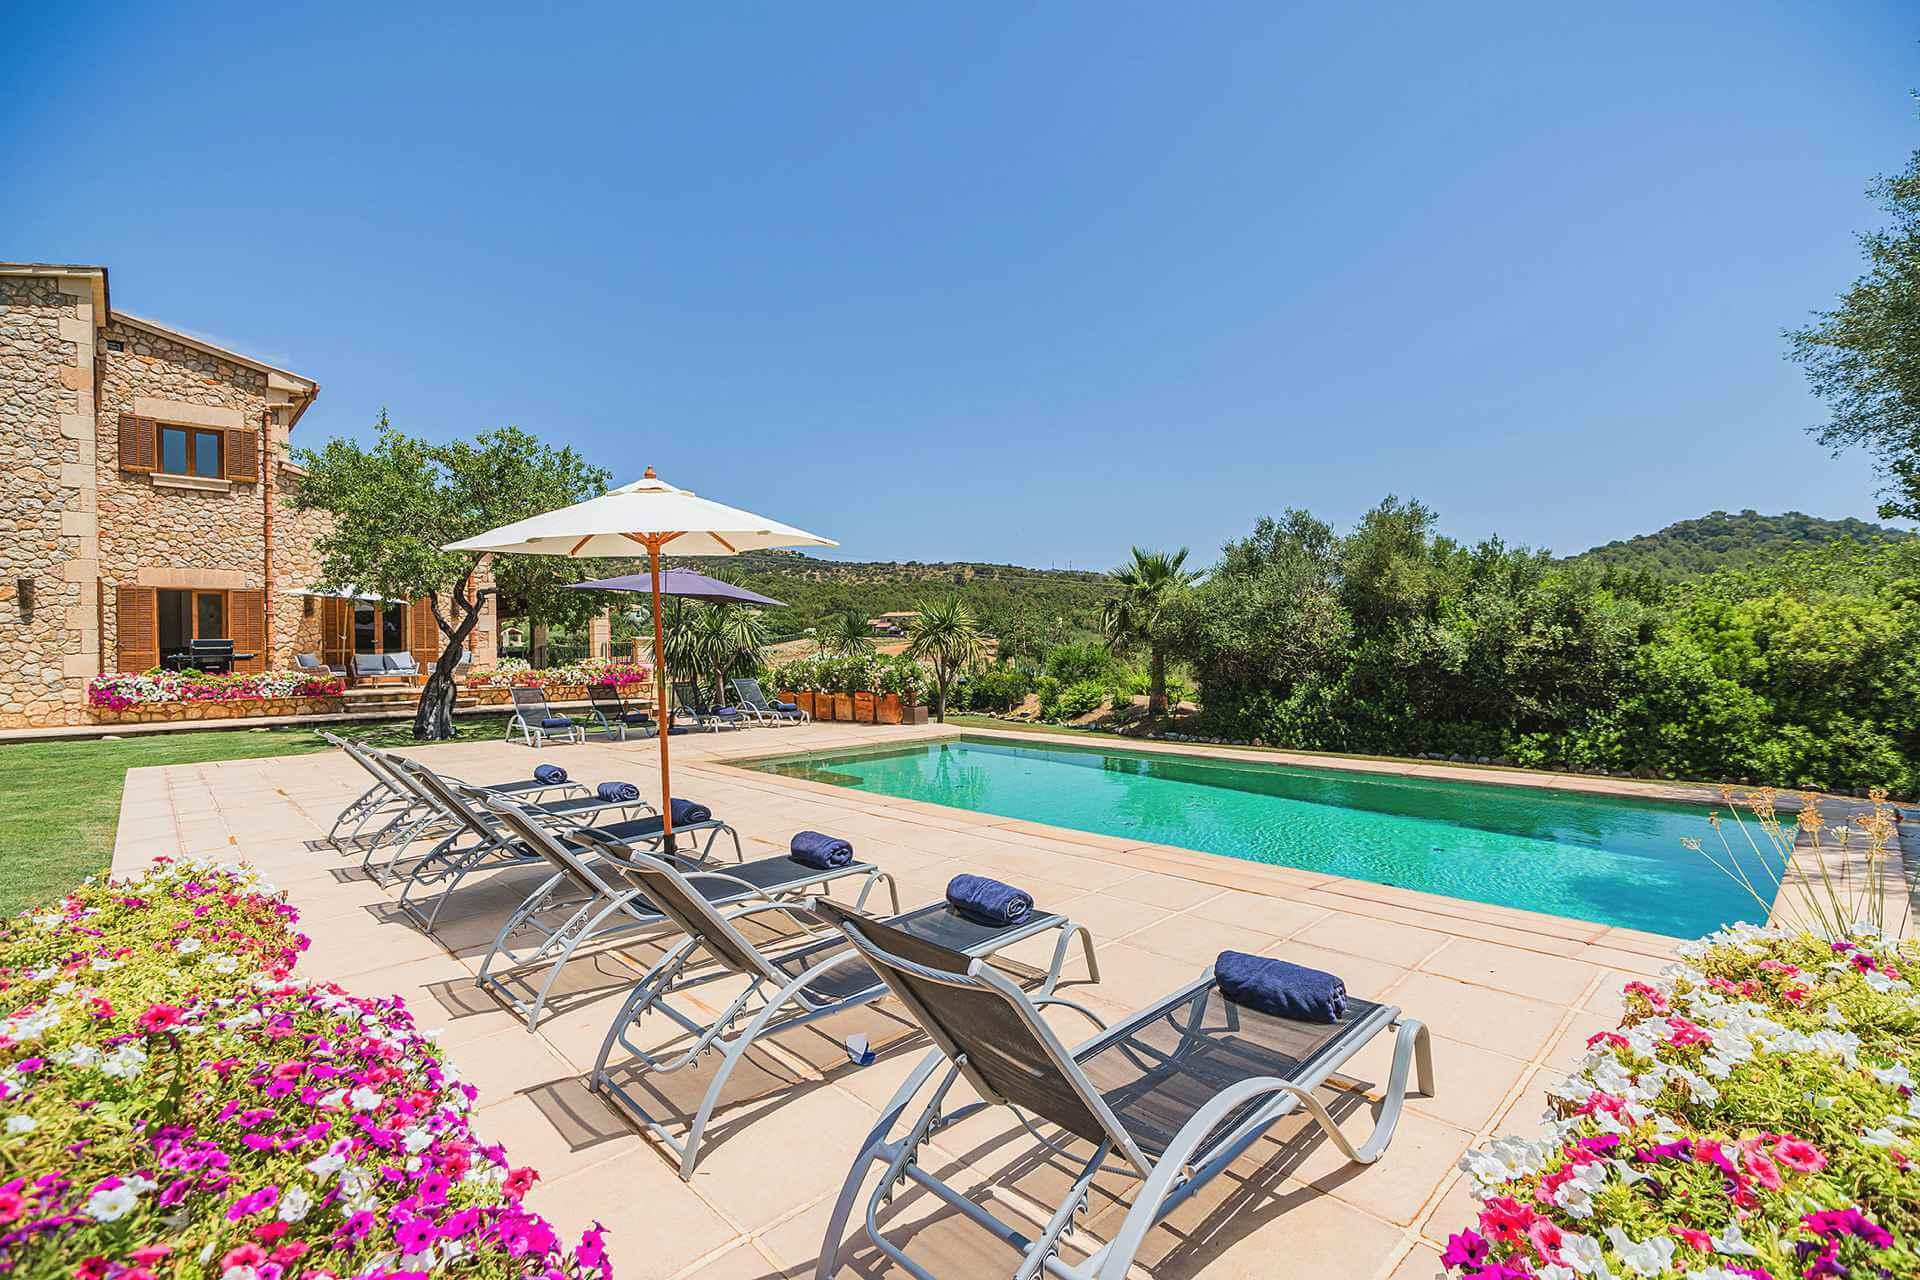 01-348 Luxus Familien Finca Norden Mallorca Bild 1